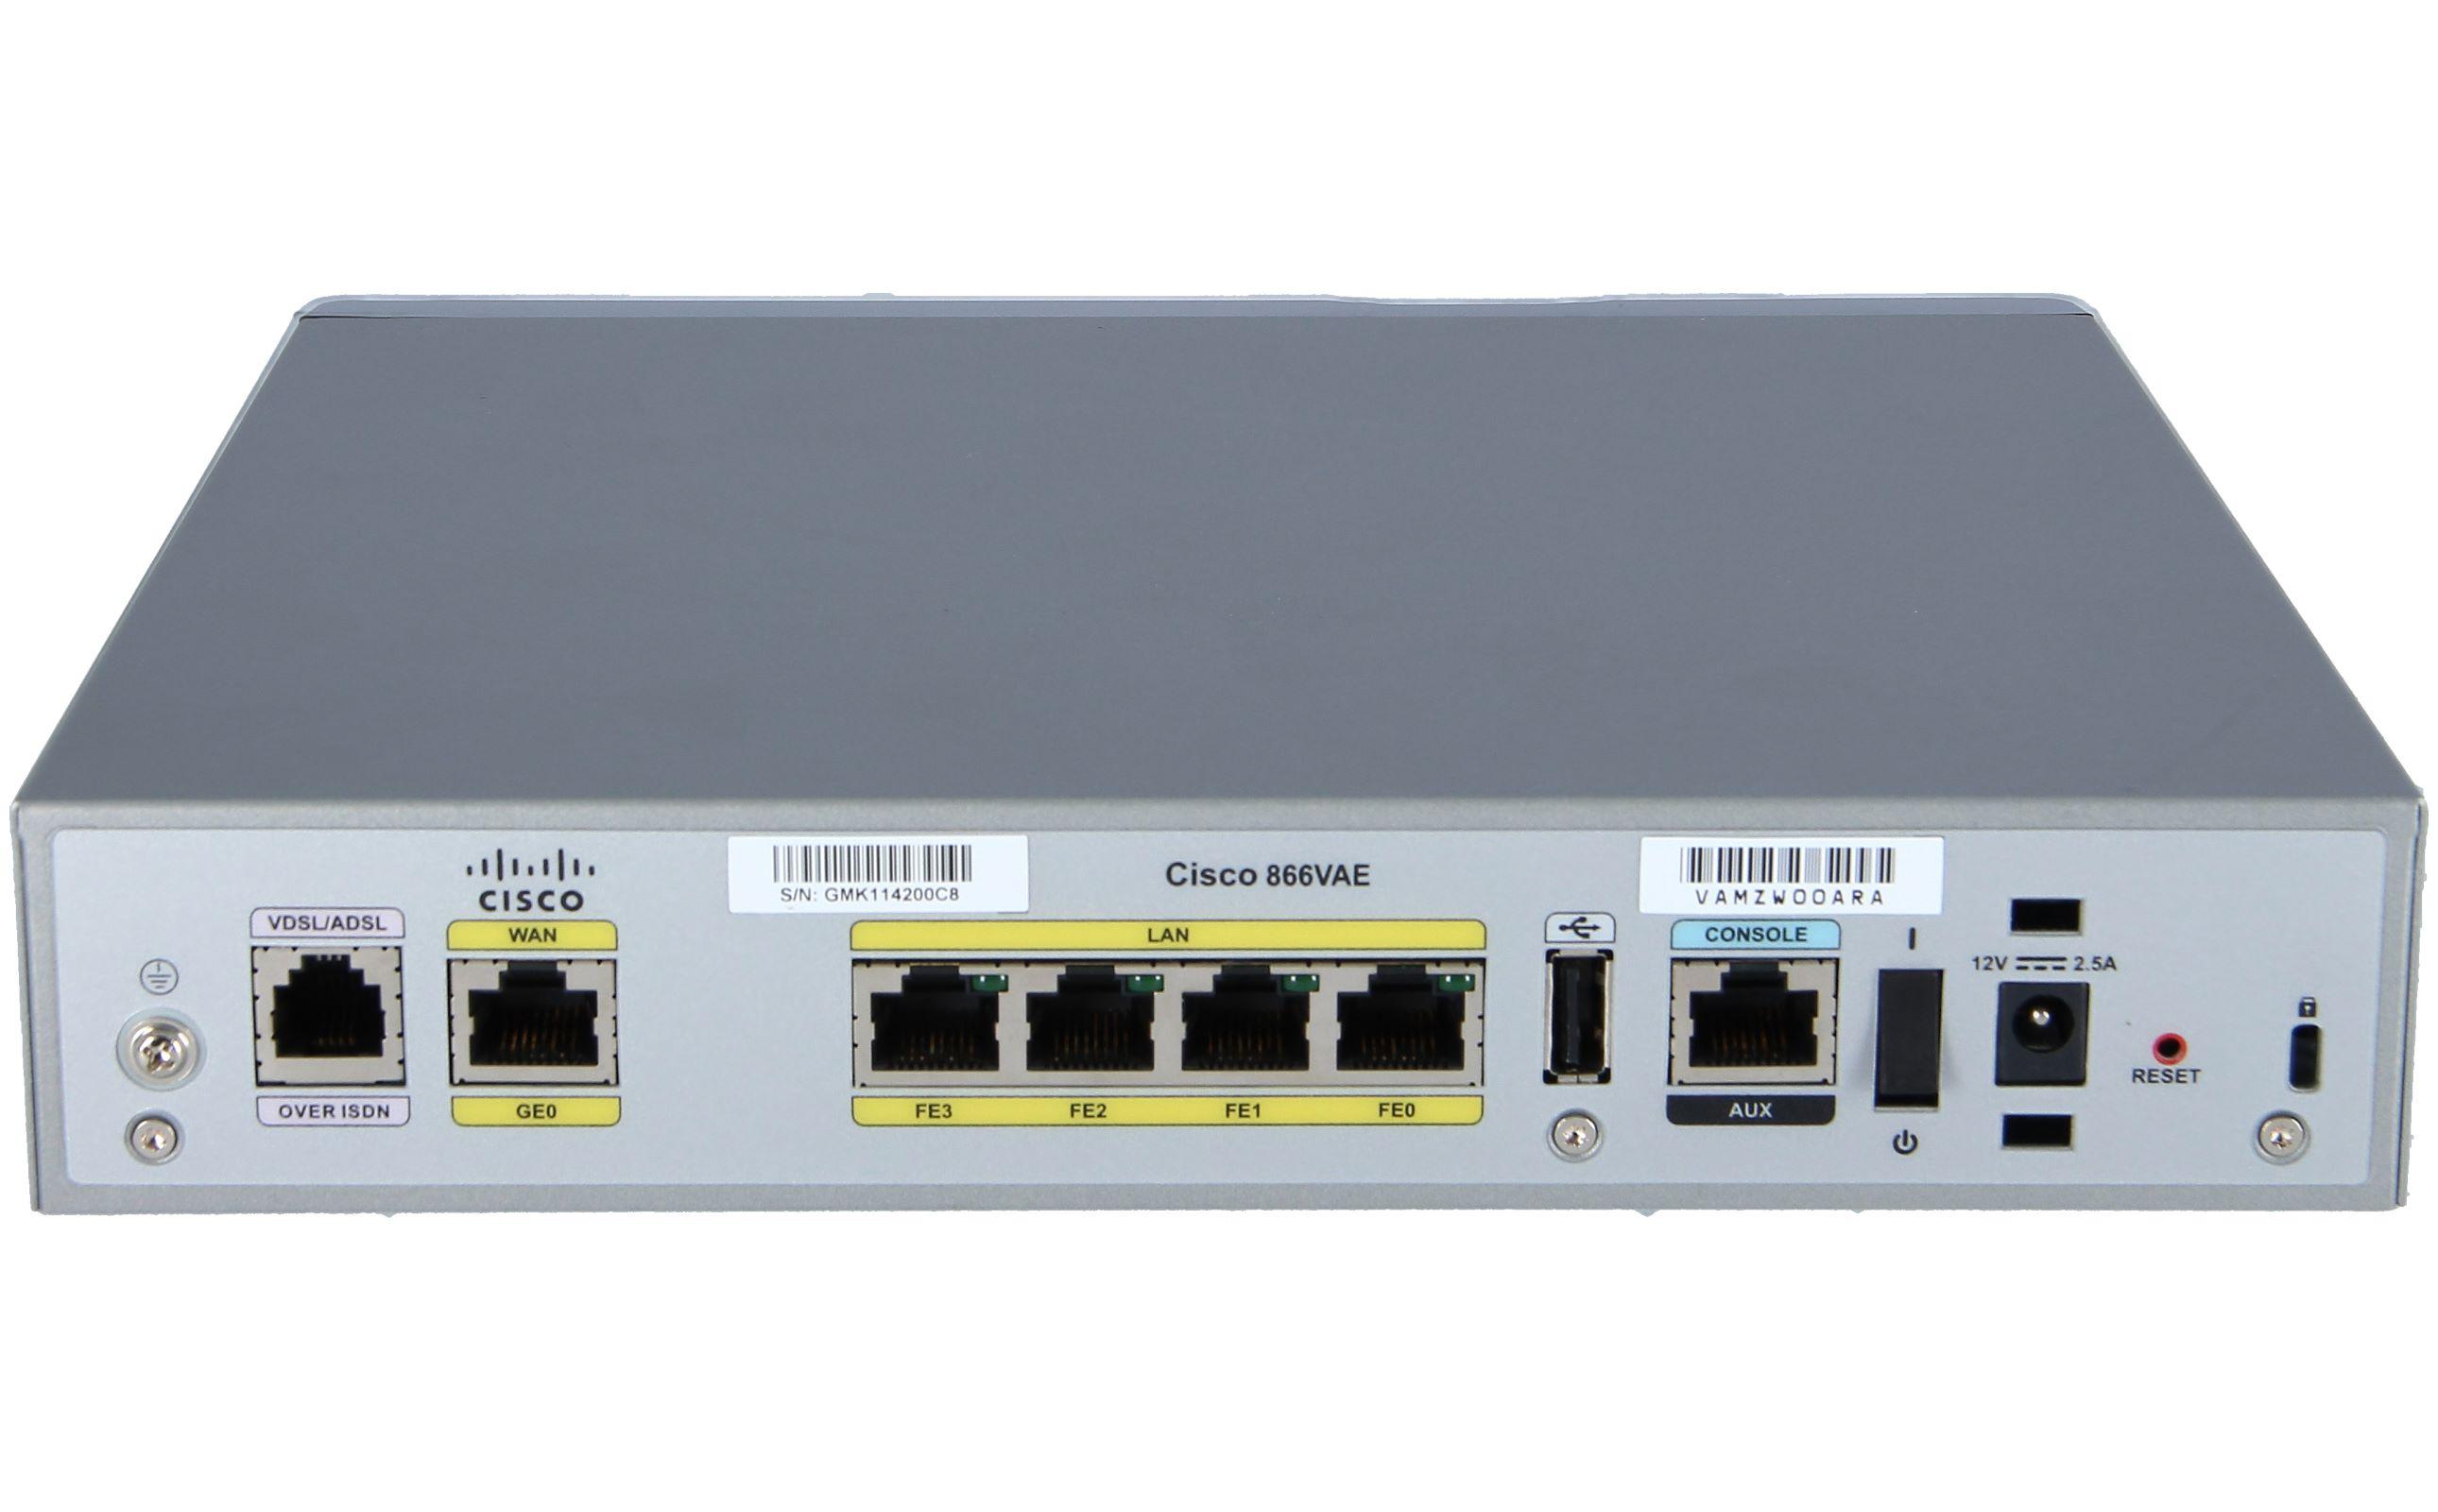 Cisco CISCO866VAE-K9 866Vae Secure Router